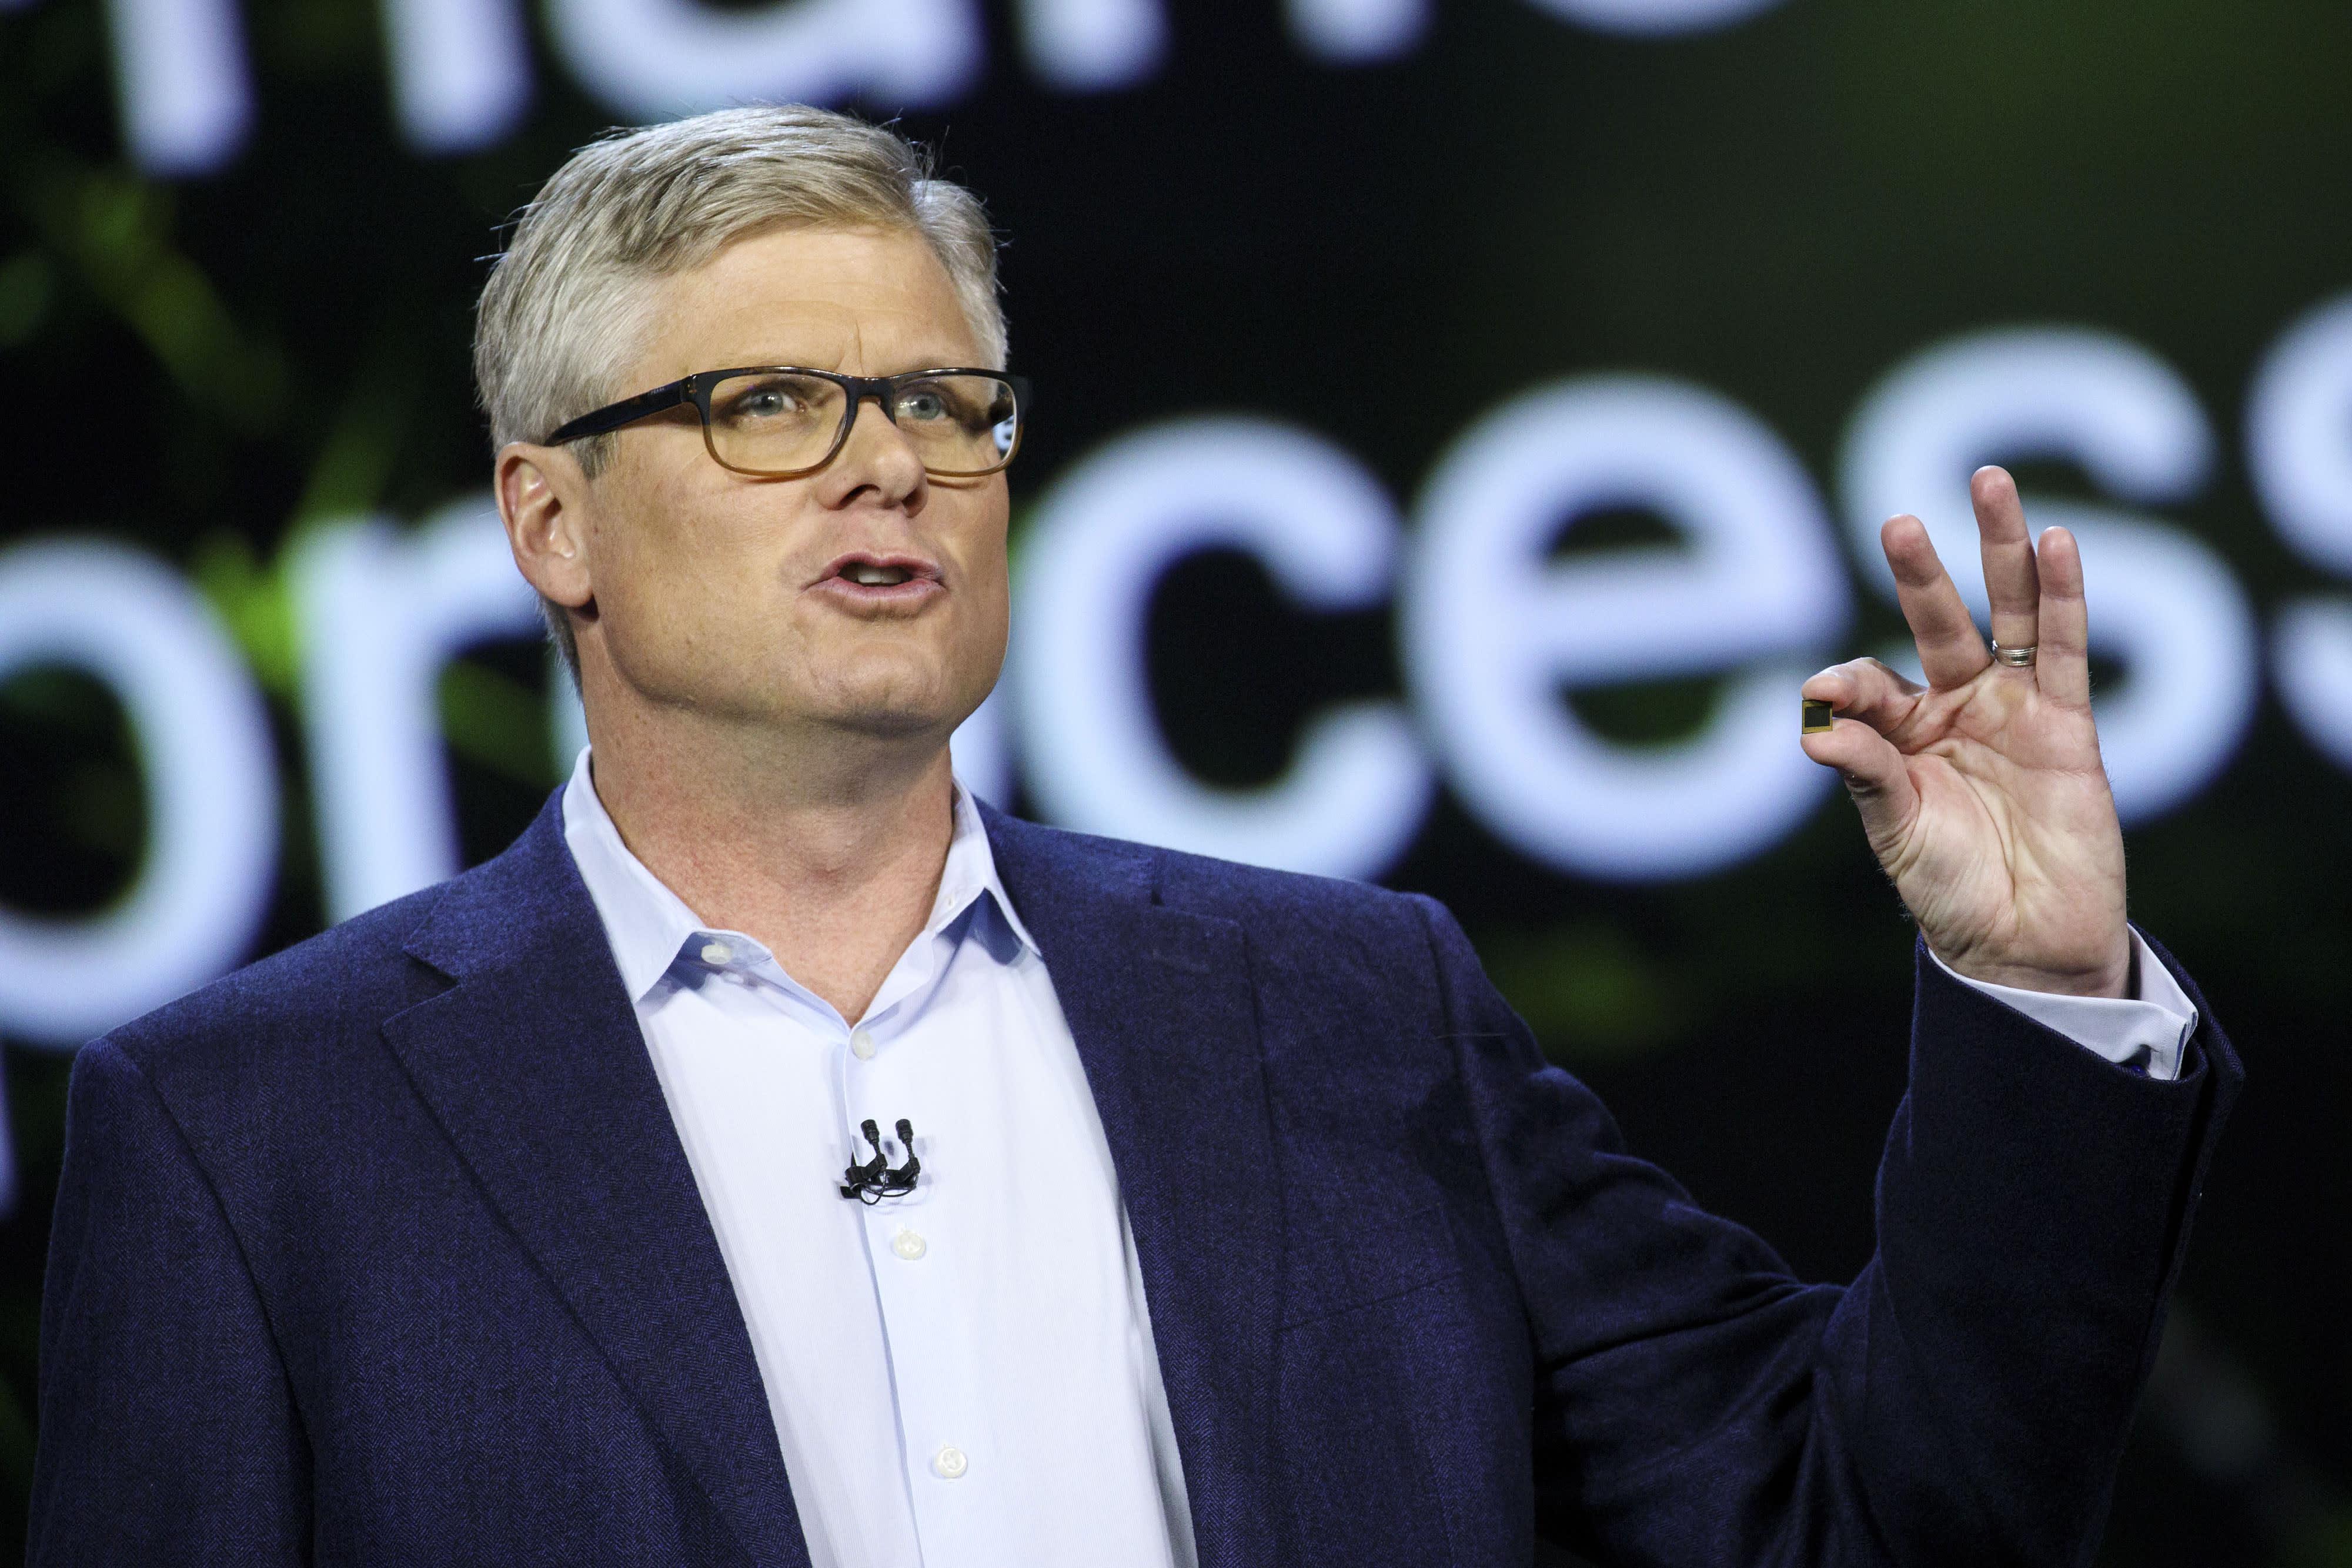 Apple ceo total compensation